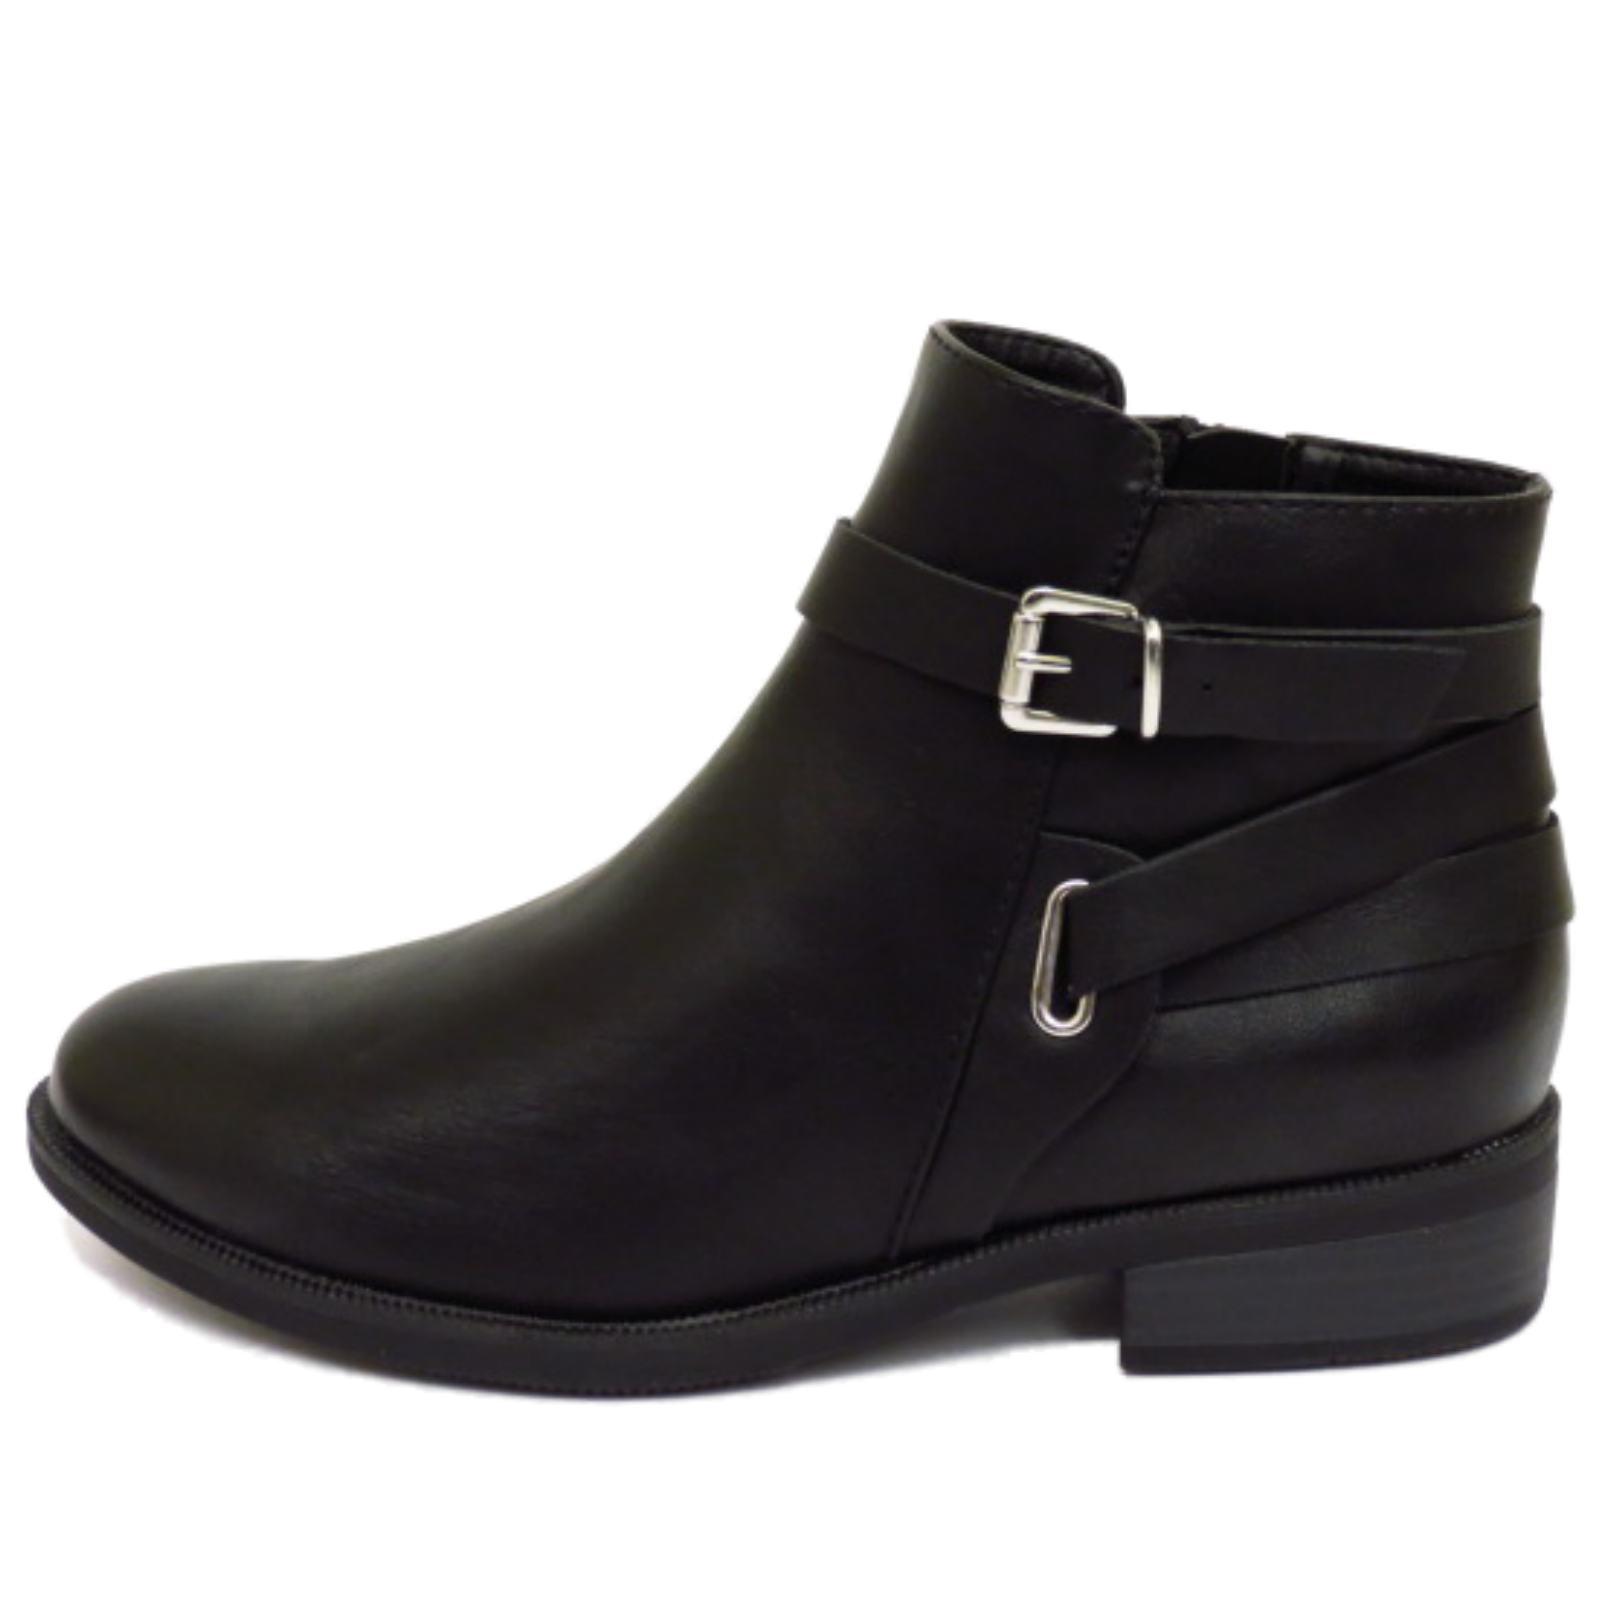 WOMENS BLACK FLAT ZIP-UP BIKER ANKLE CHELSEA PIXIE BOOTS SMART WORK SHOES UK 3-8 | EBay